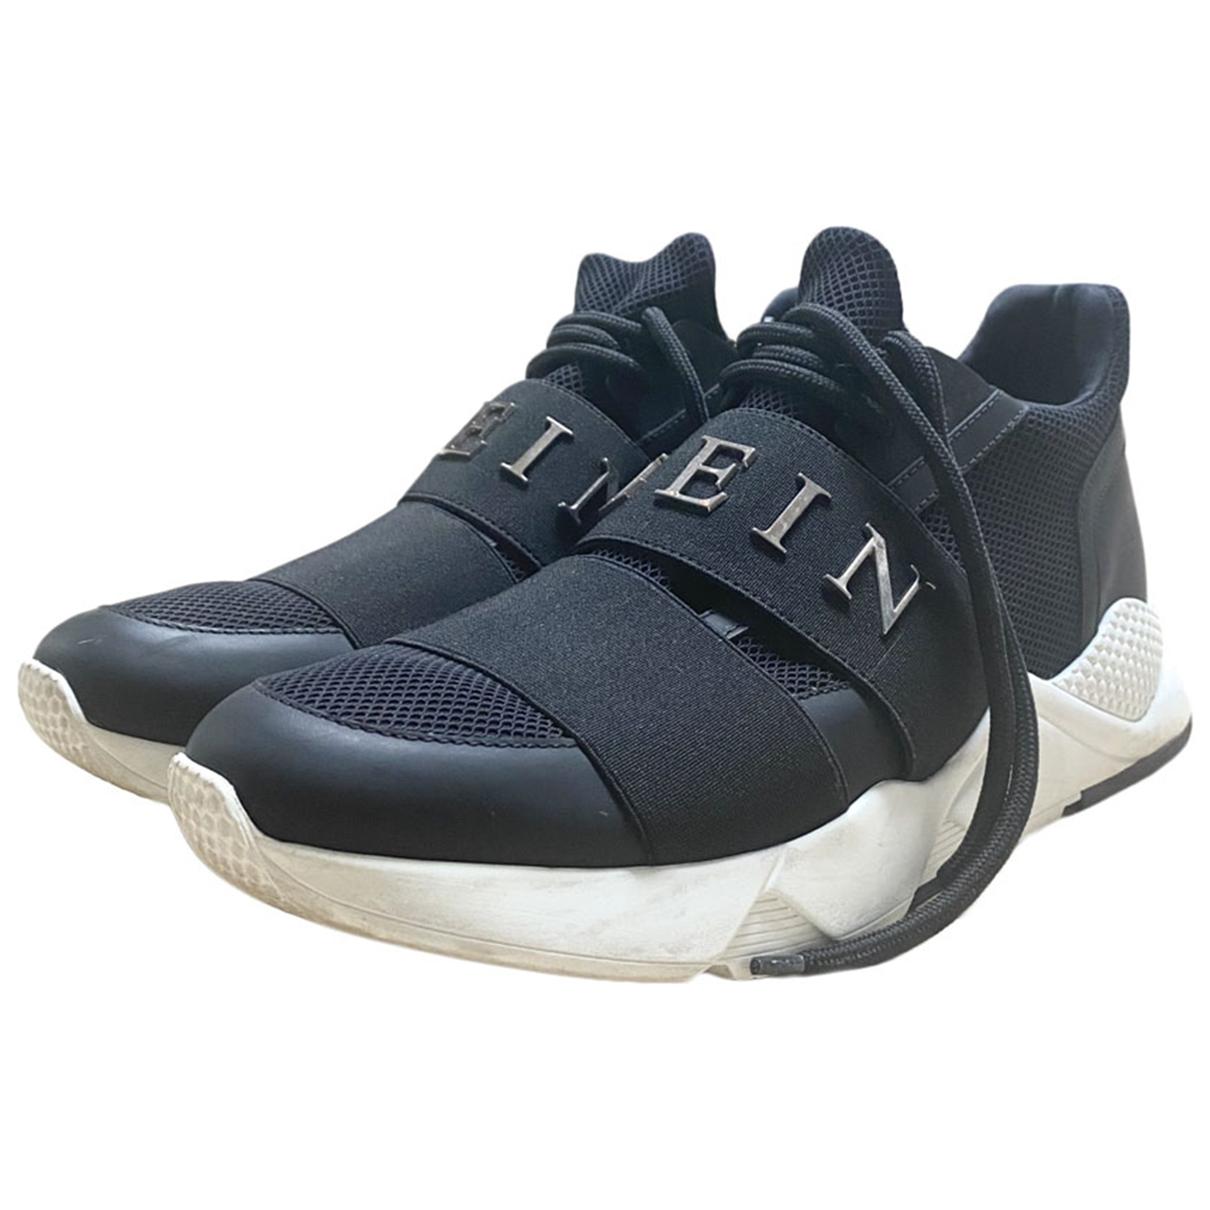 Philipp Plein Phantom Kick$ Sneakers in  Schwarz Leder